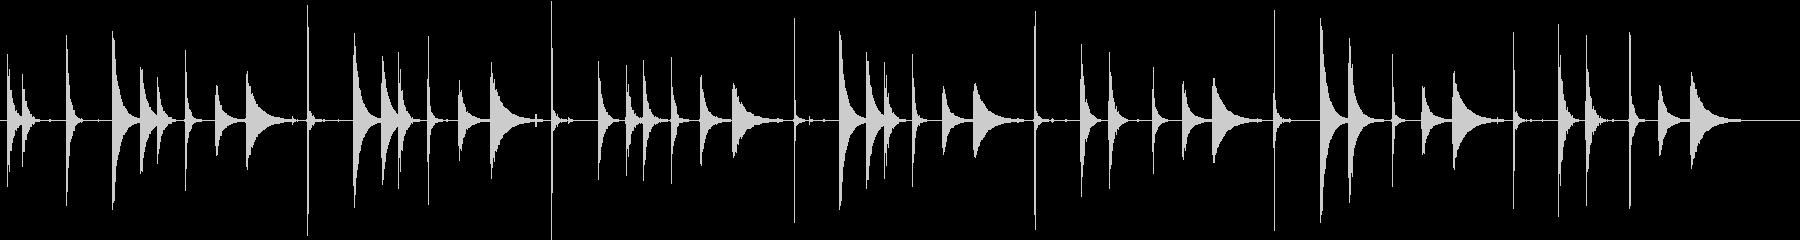 Guanguanco:Funk R...の未再生の波形